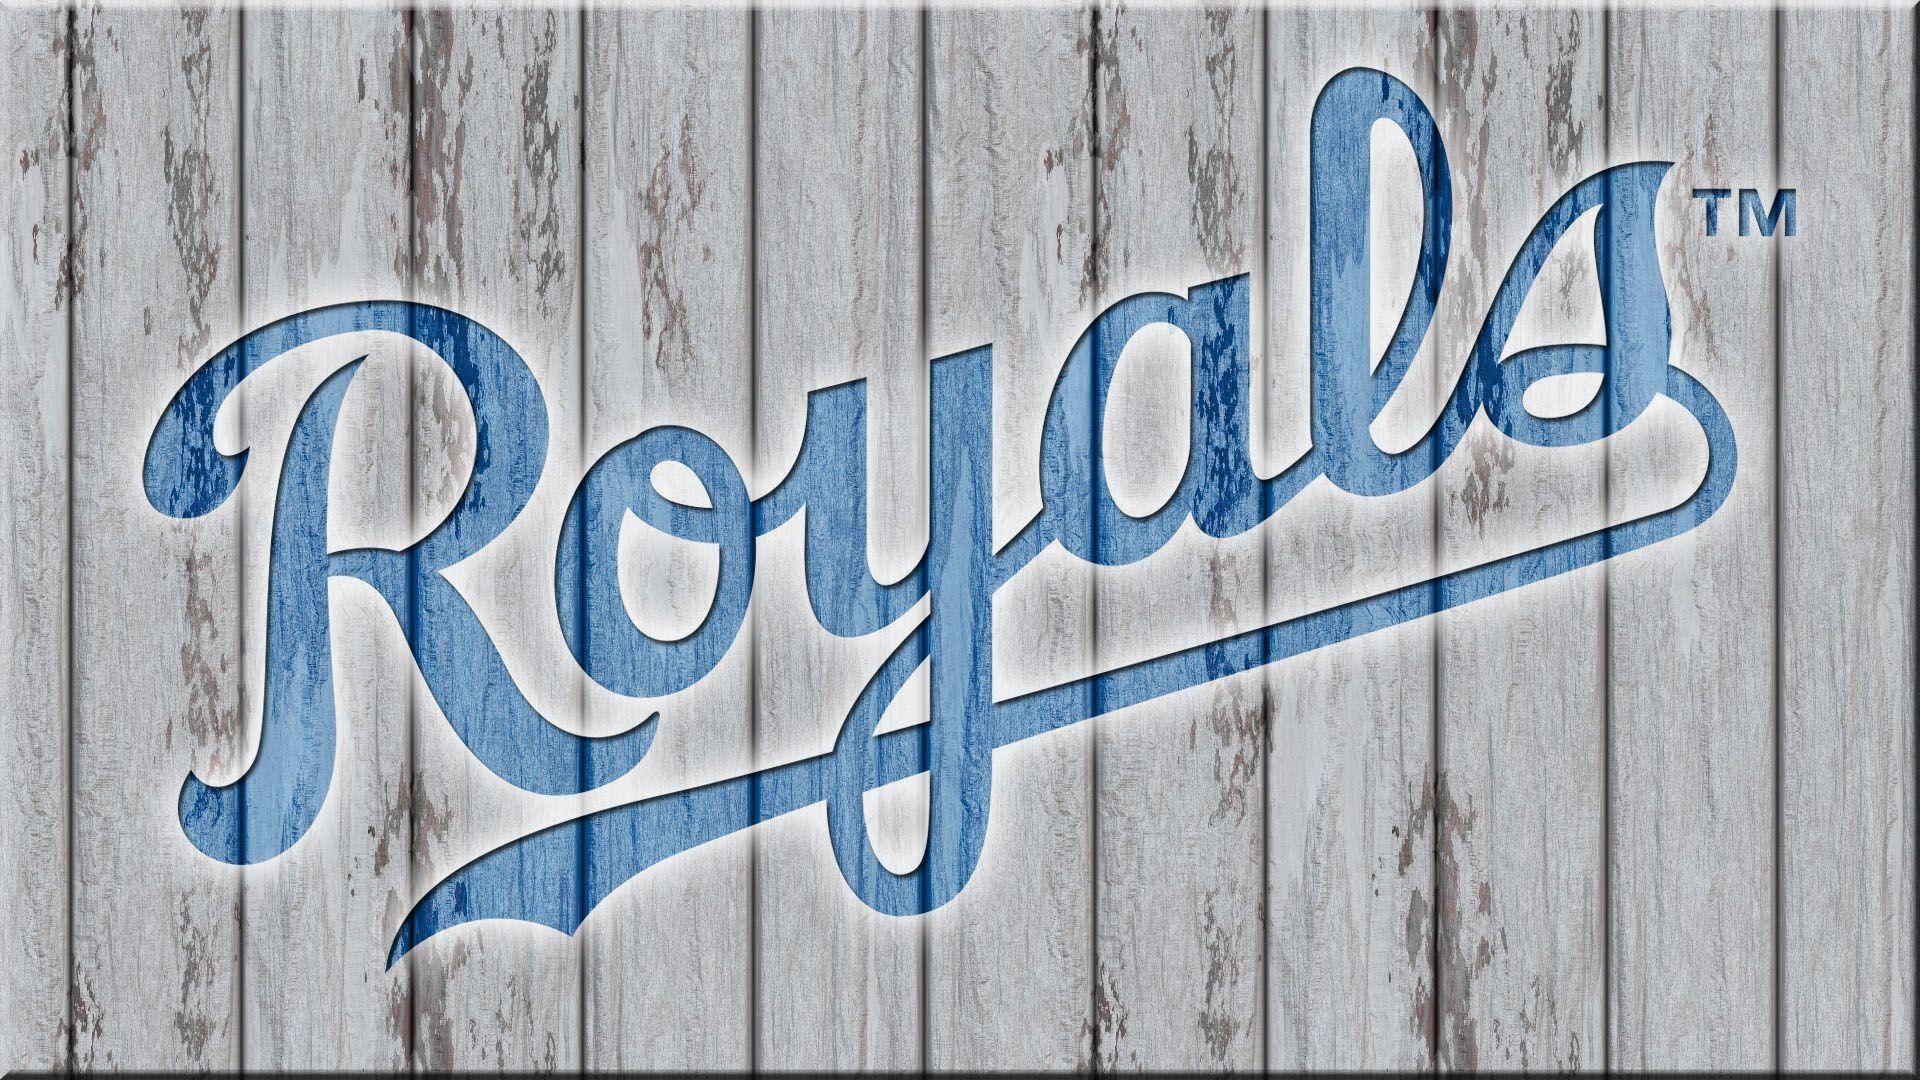 Kansas City Royals Wallpaper Free Desktop 8 HD Wallpapers .